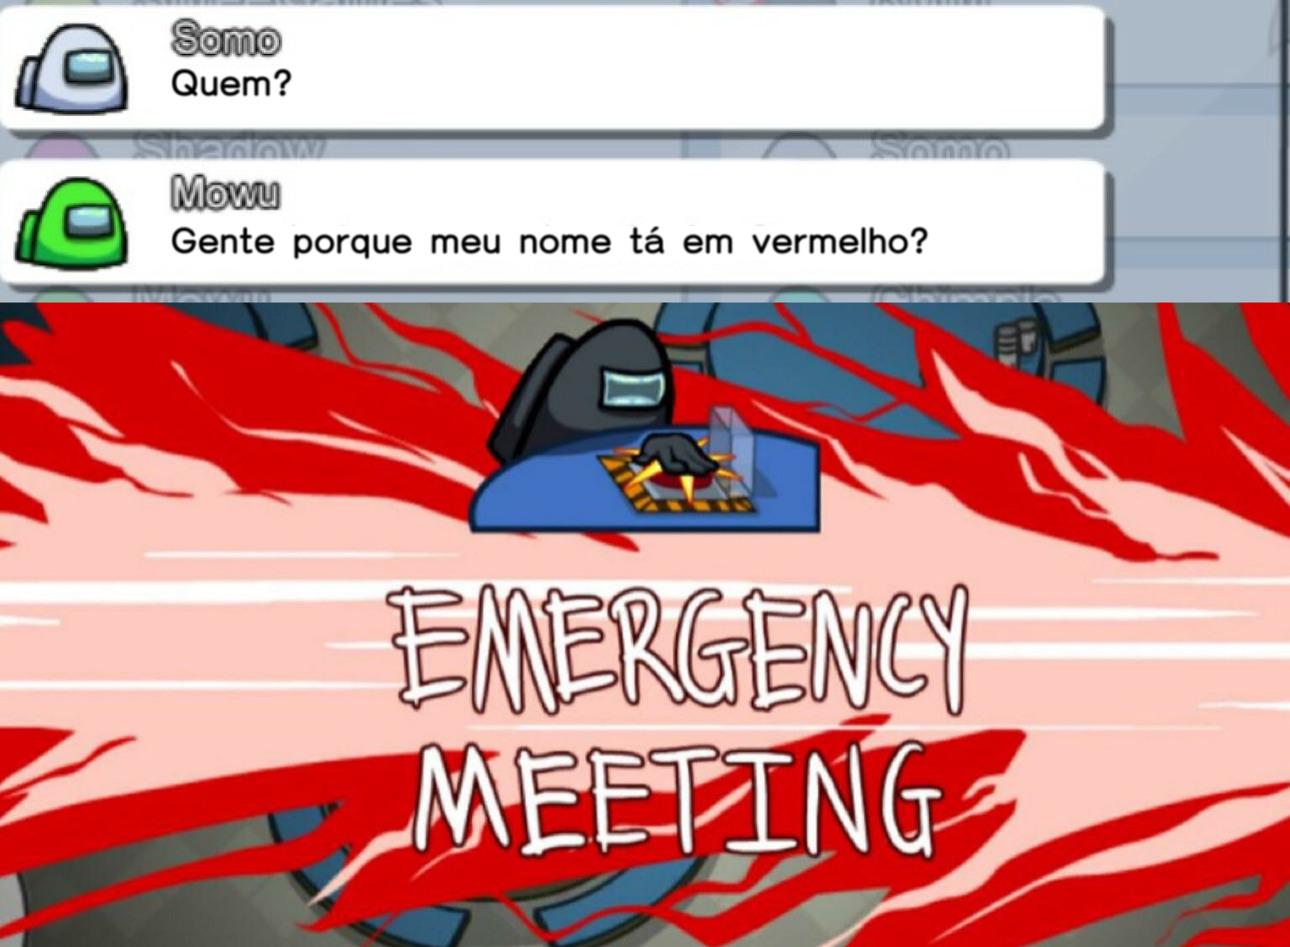 Mowu - meme